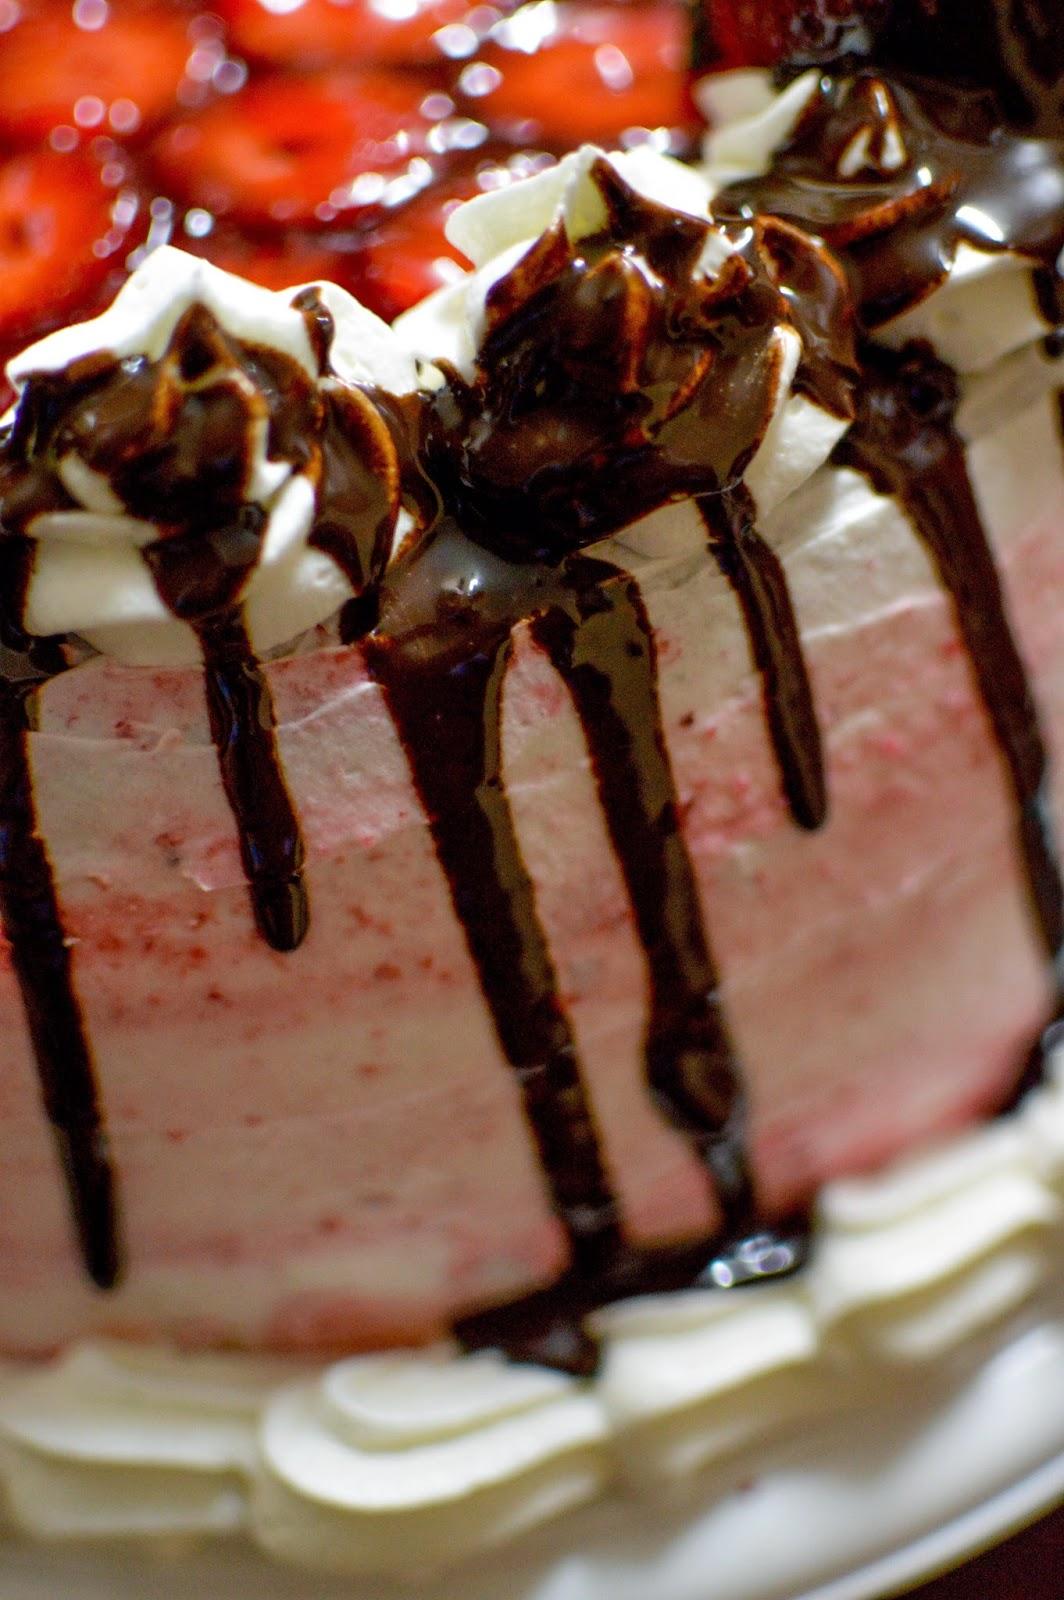 Baño De Torta Sencillo:ENDULZA TU ALMA: Torta de frutillas